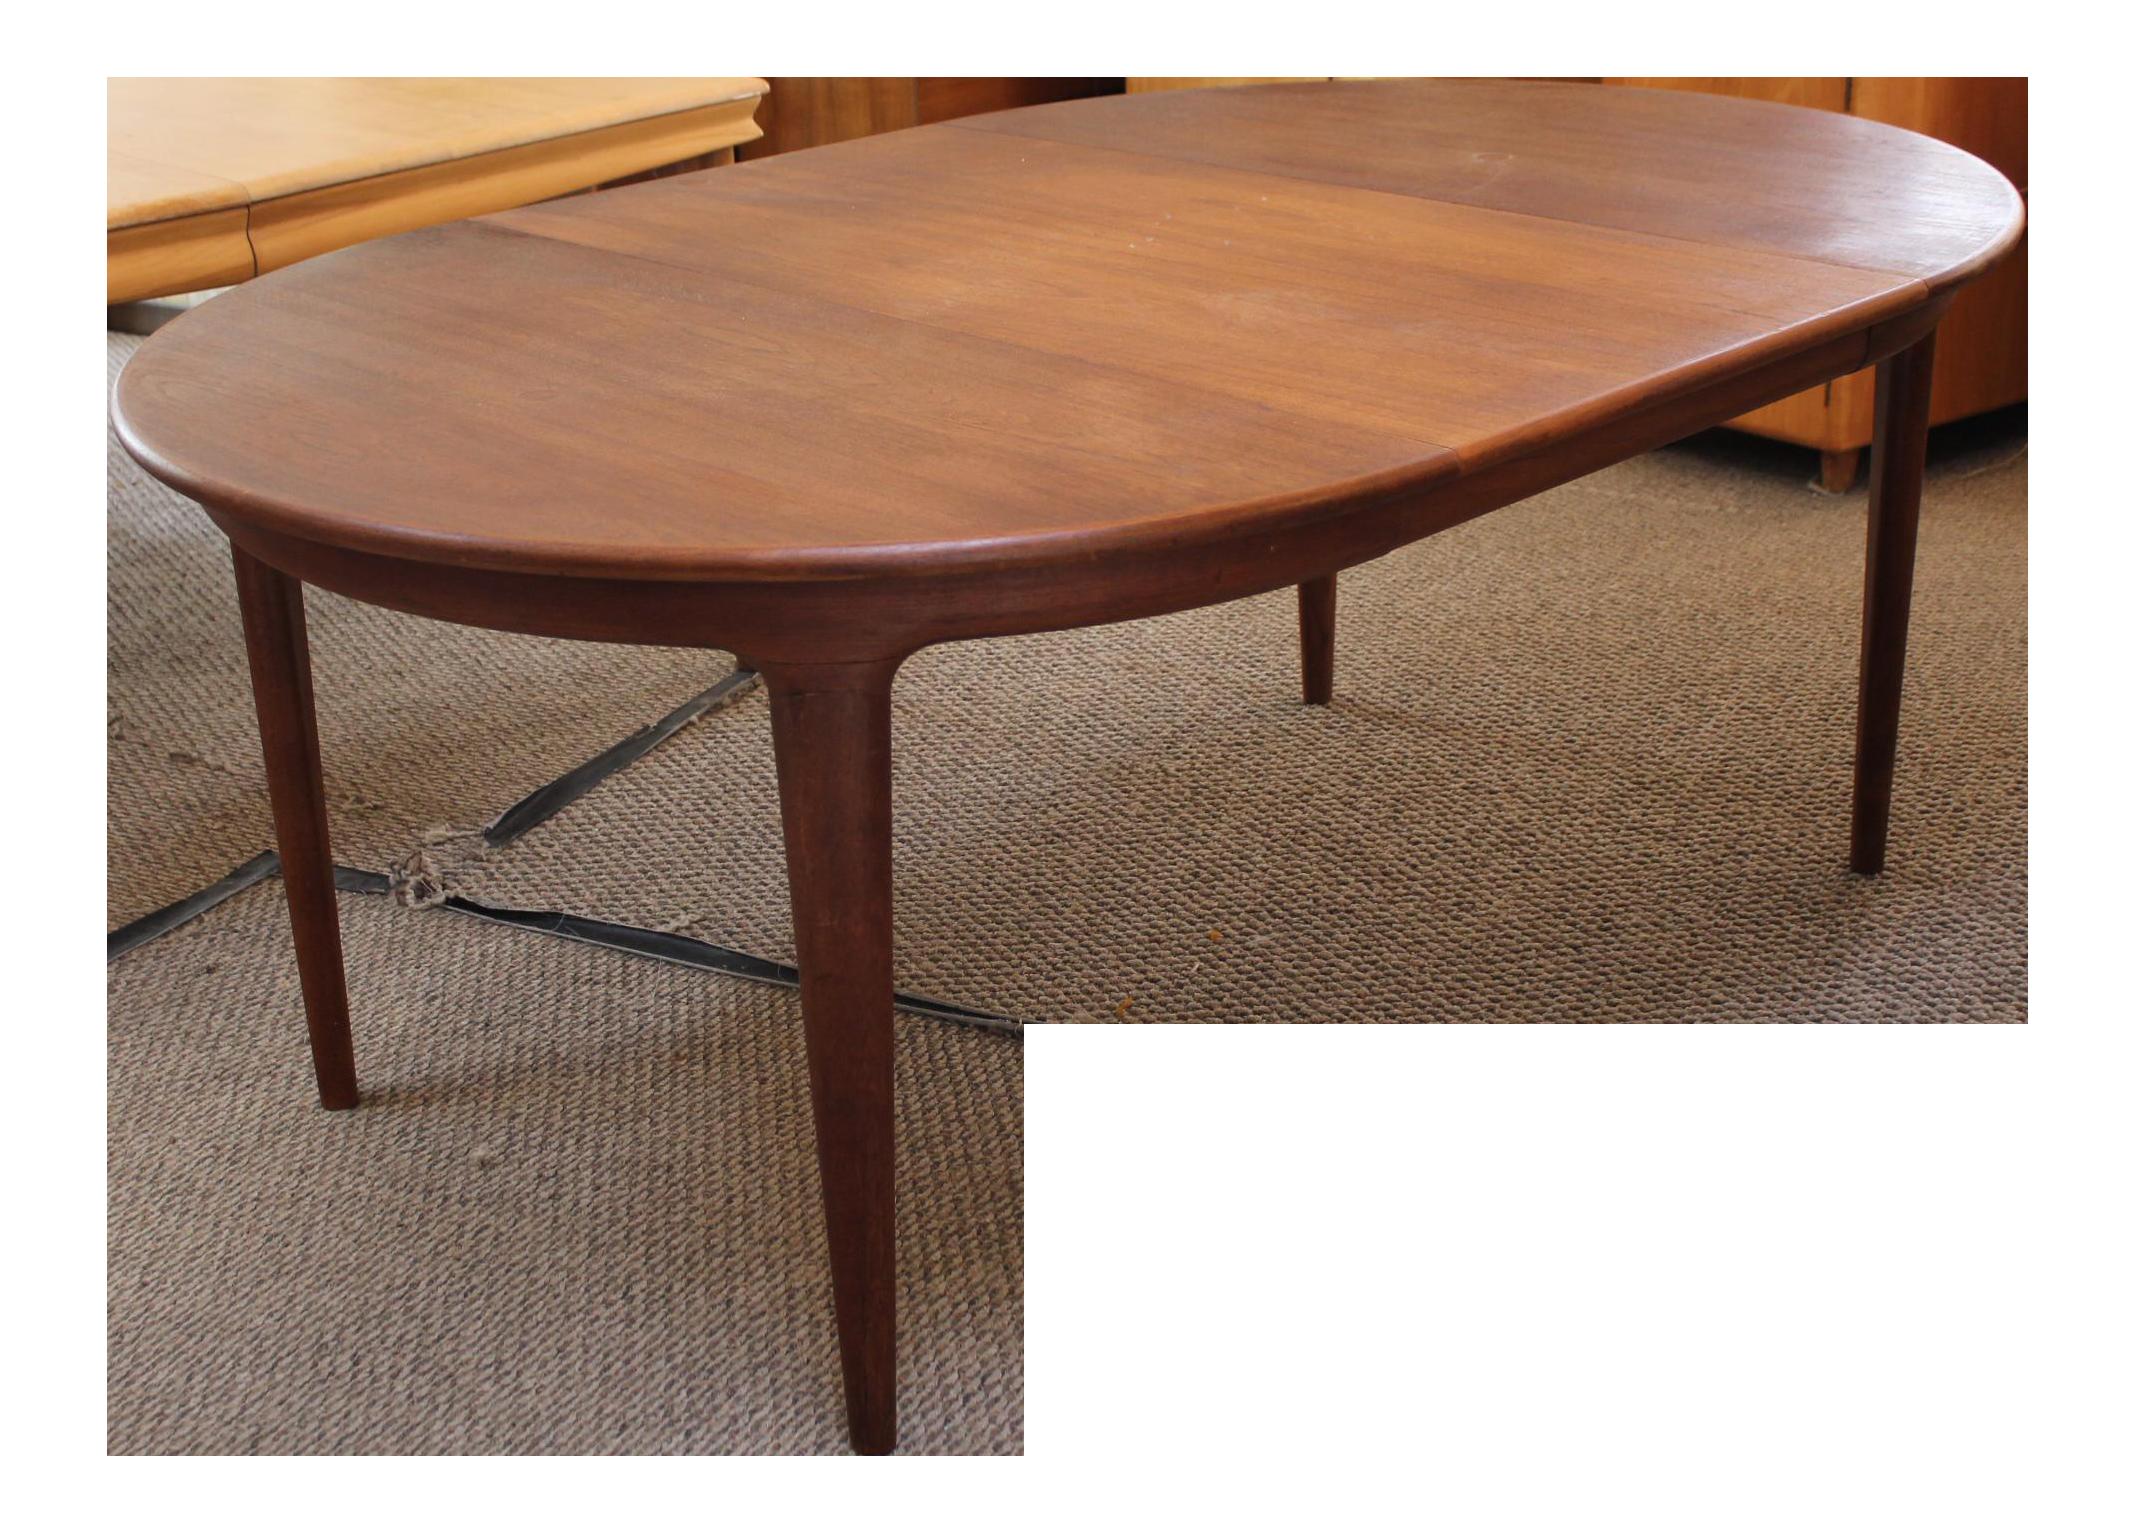 Soro Stole Round Teak Expandable Dining Table